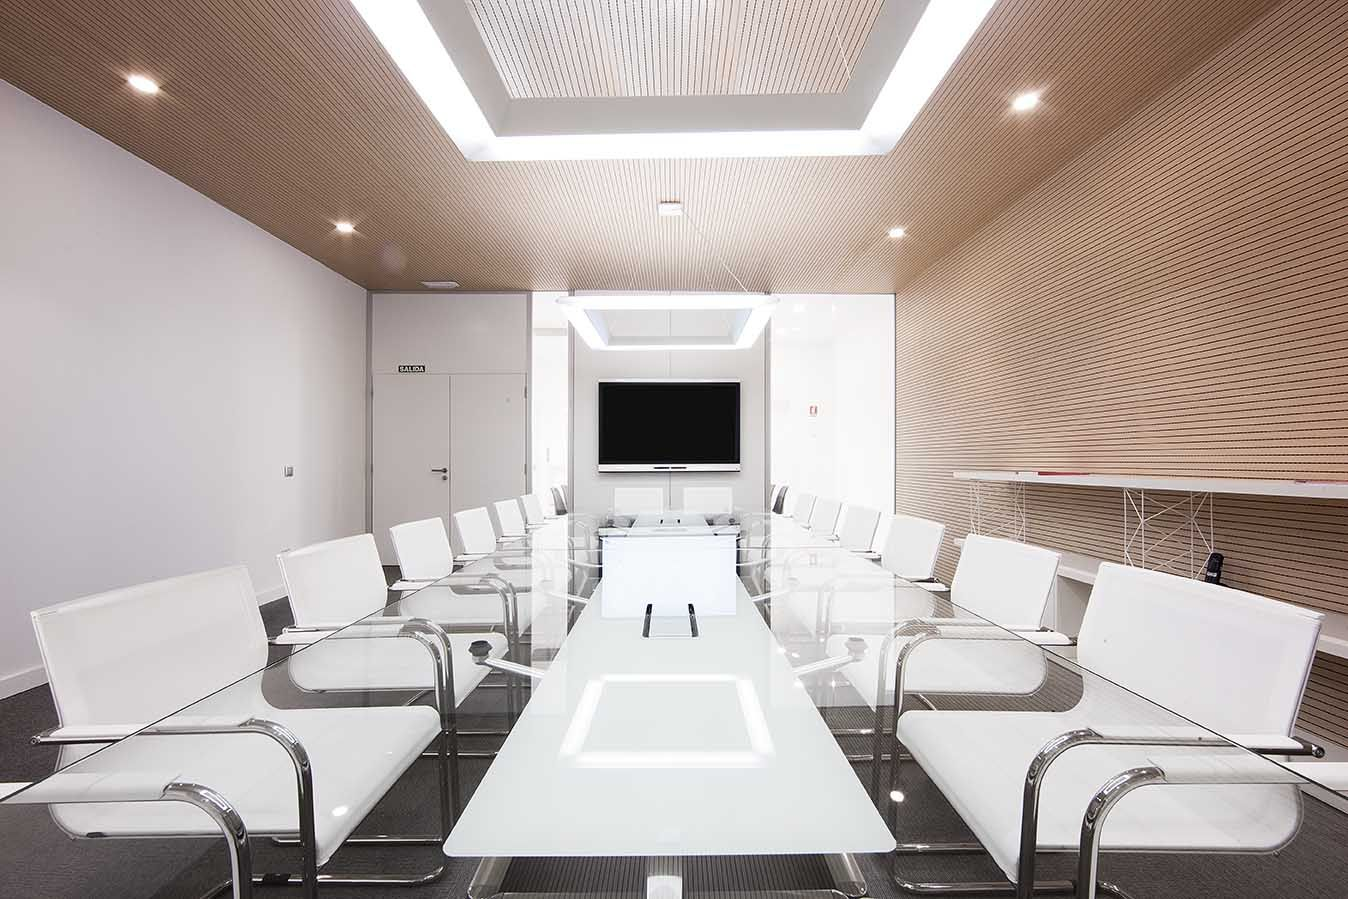 Espacio aretha ha sido seleccionada para afrontar de - Proyectos de iluminacion interior ...